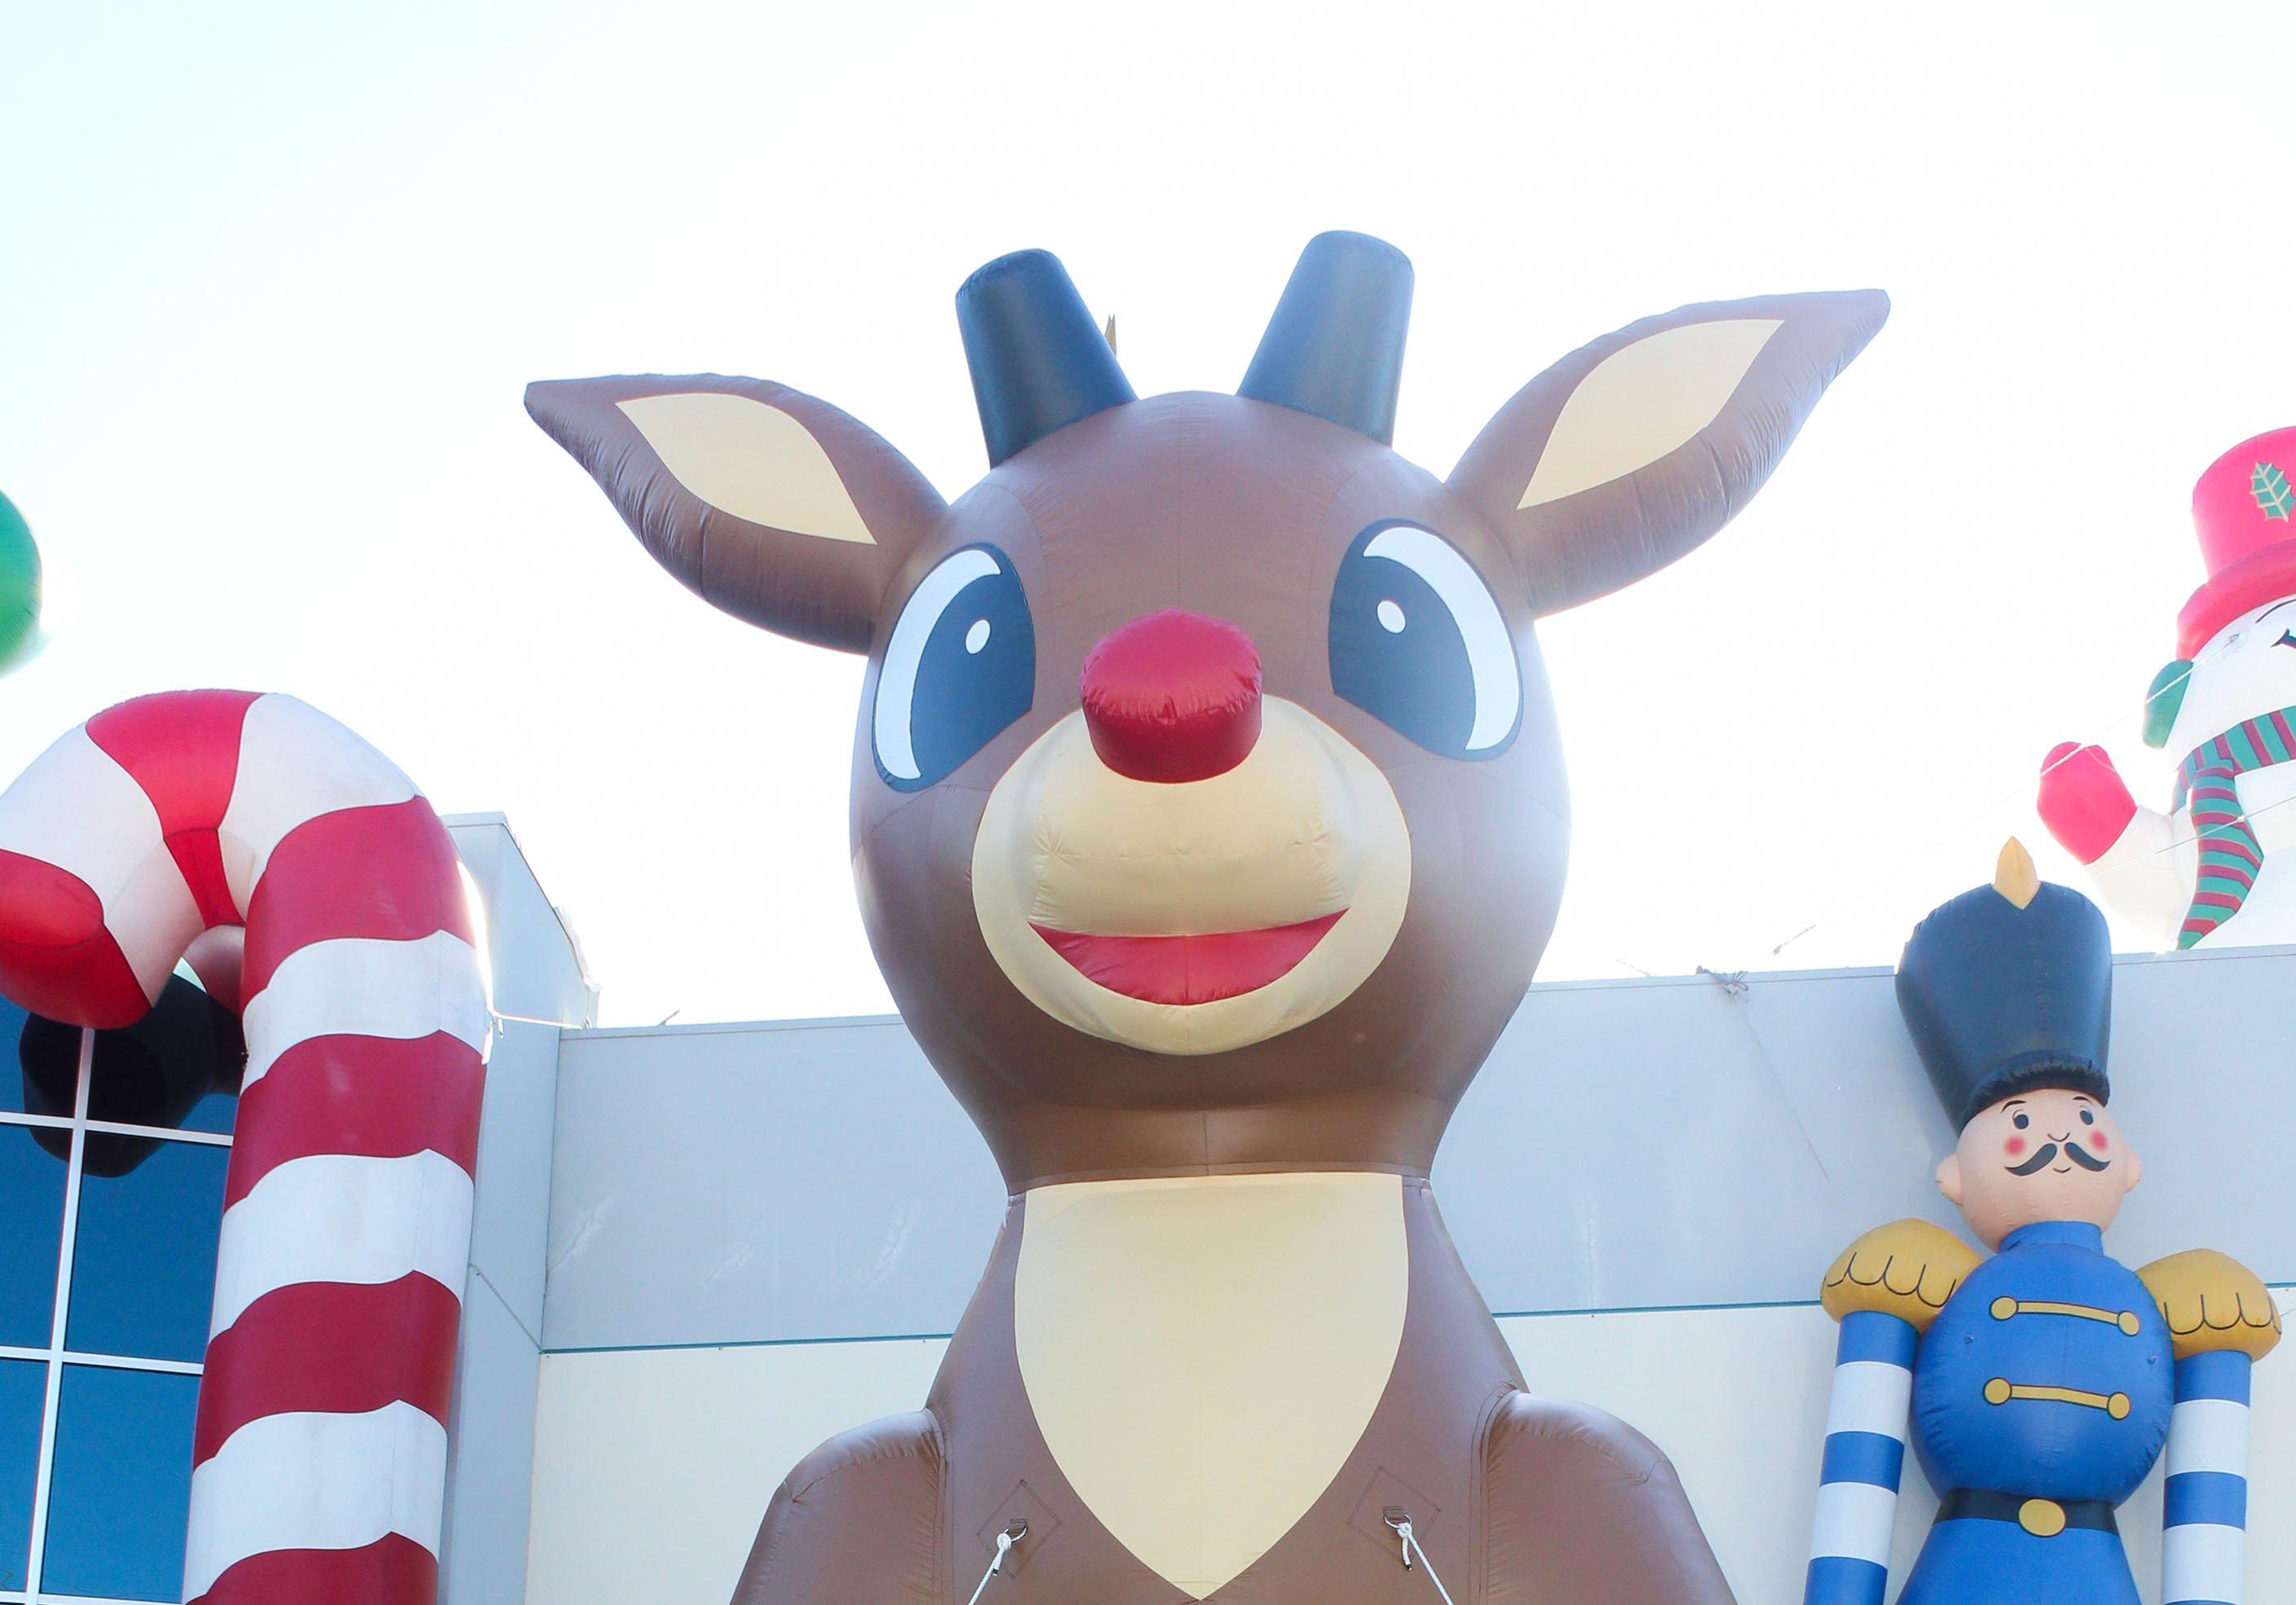 rudolph-the-red-nose-reindeer-header.jpg